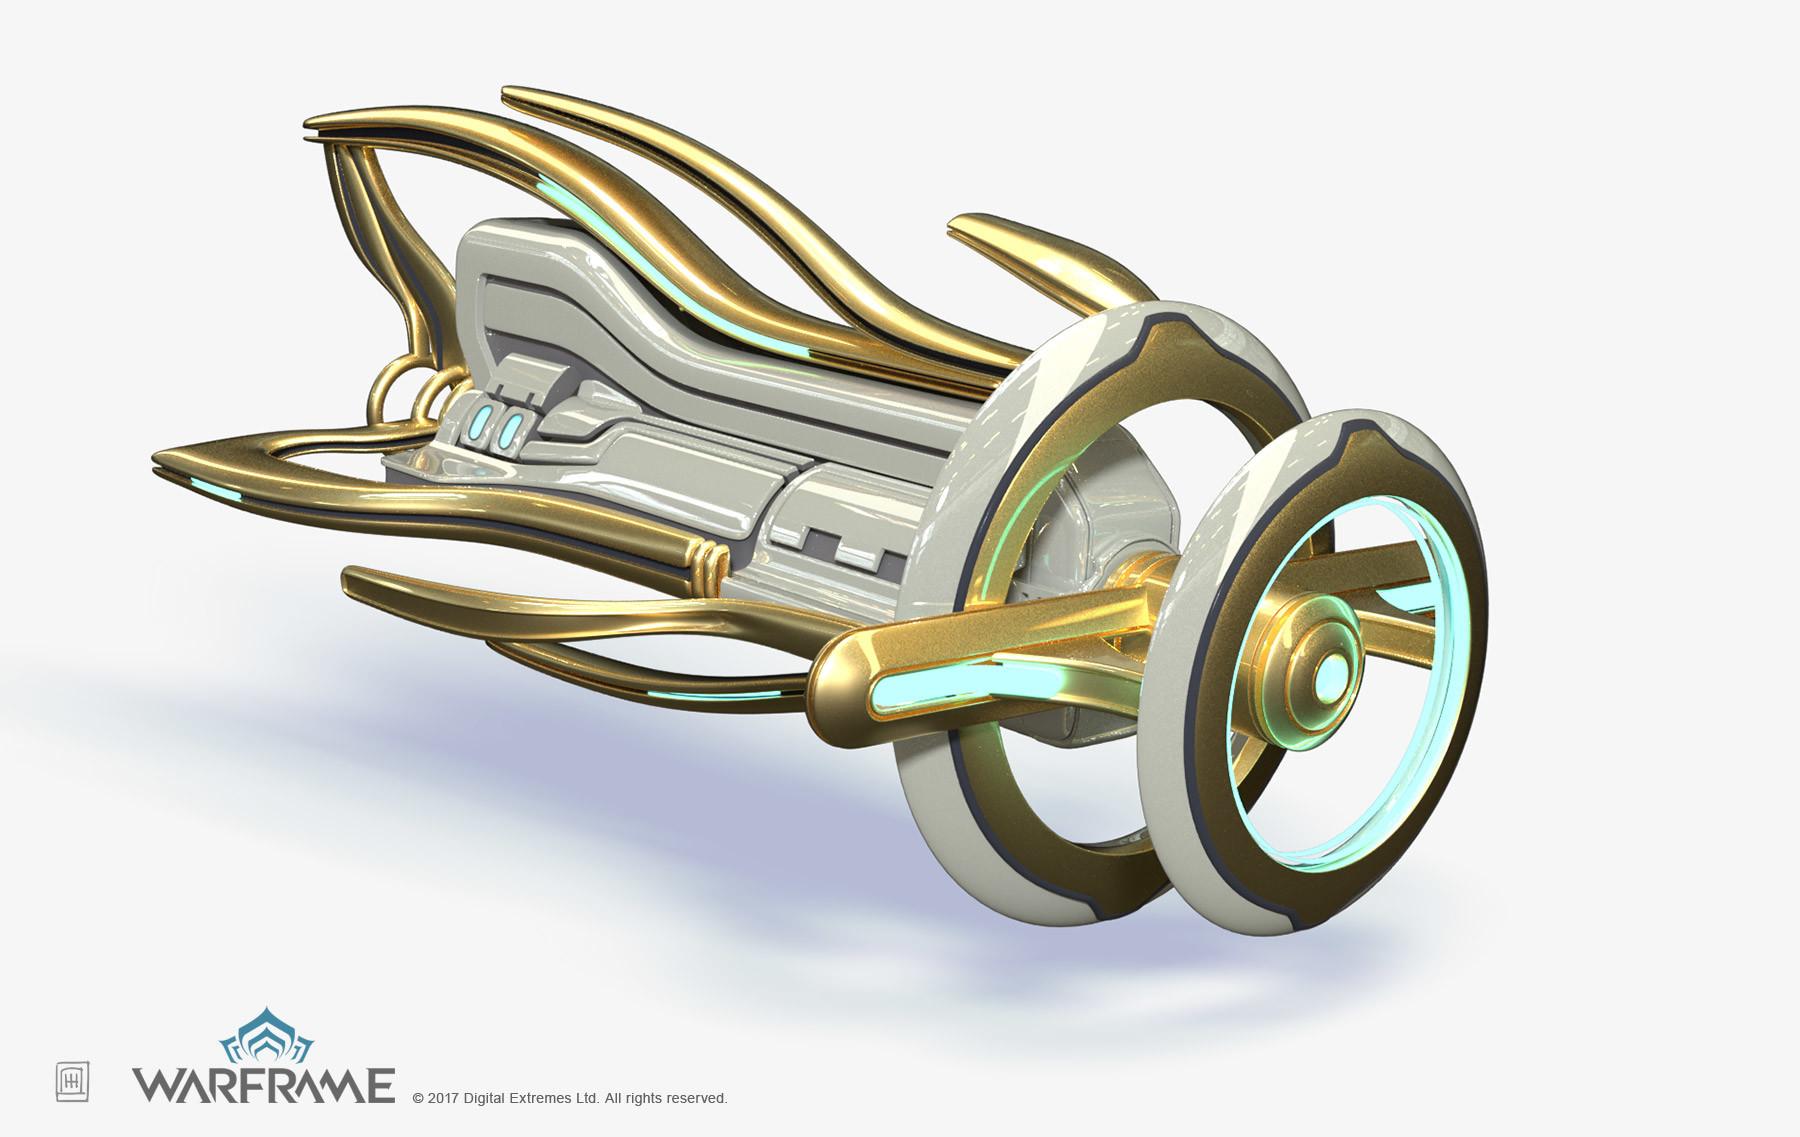 Warframe Concept Art by Zeljko Duvnjak